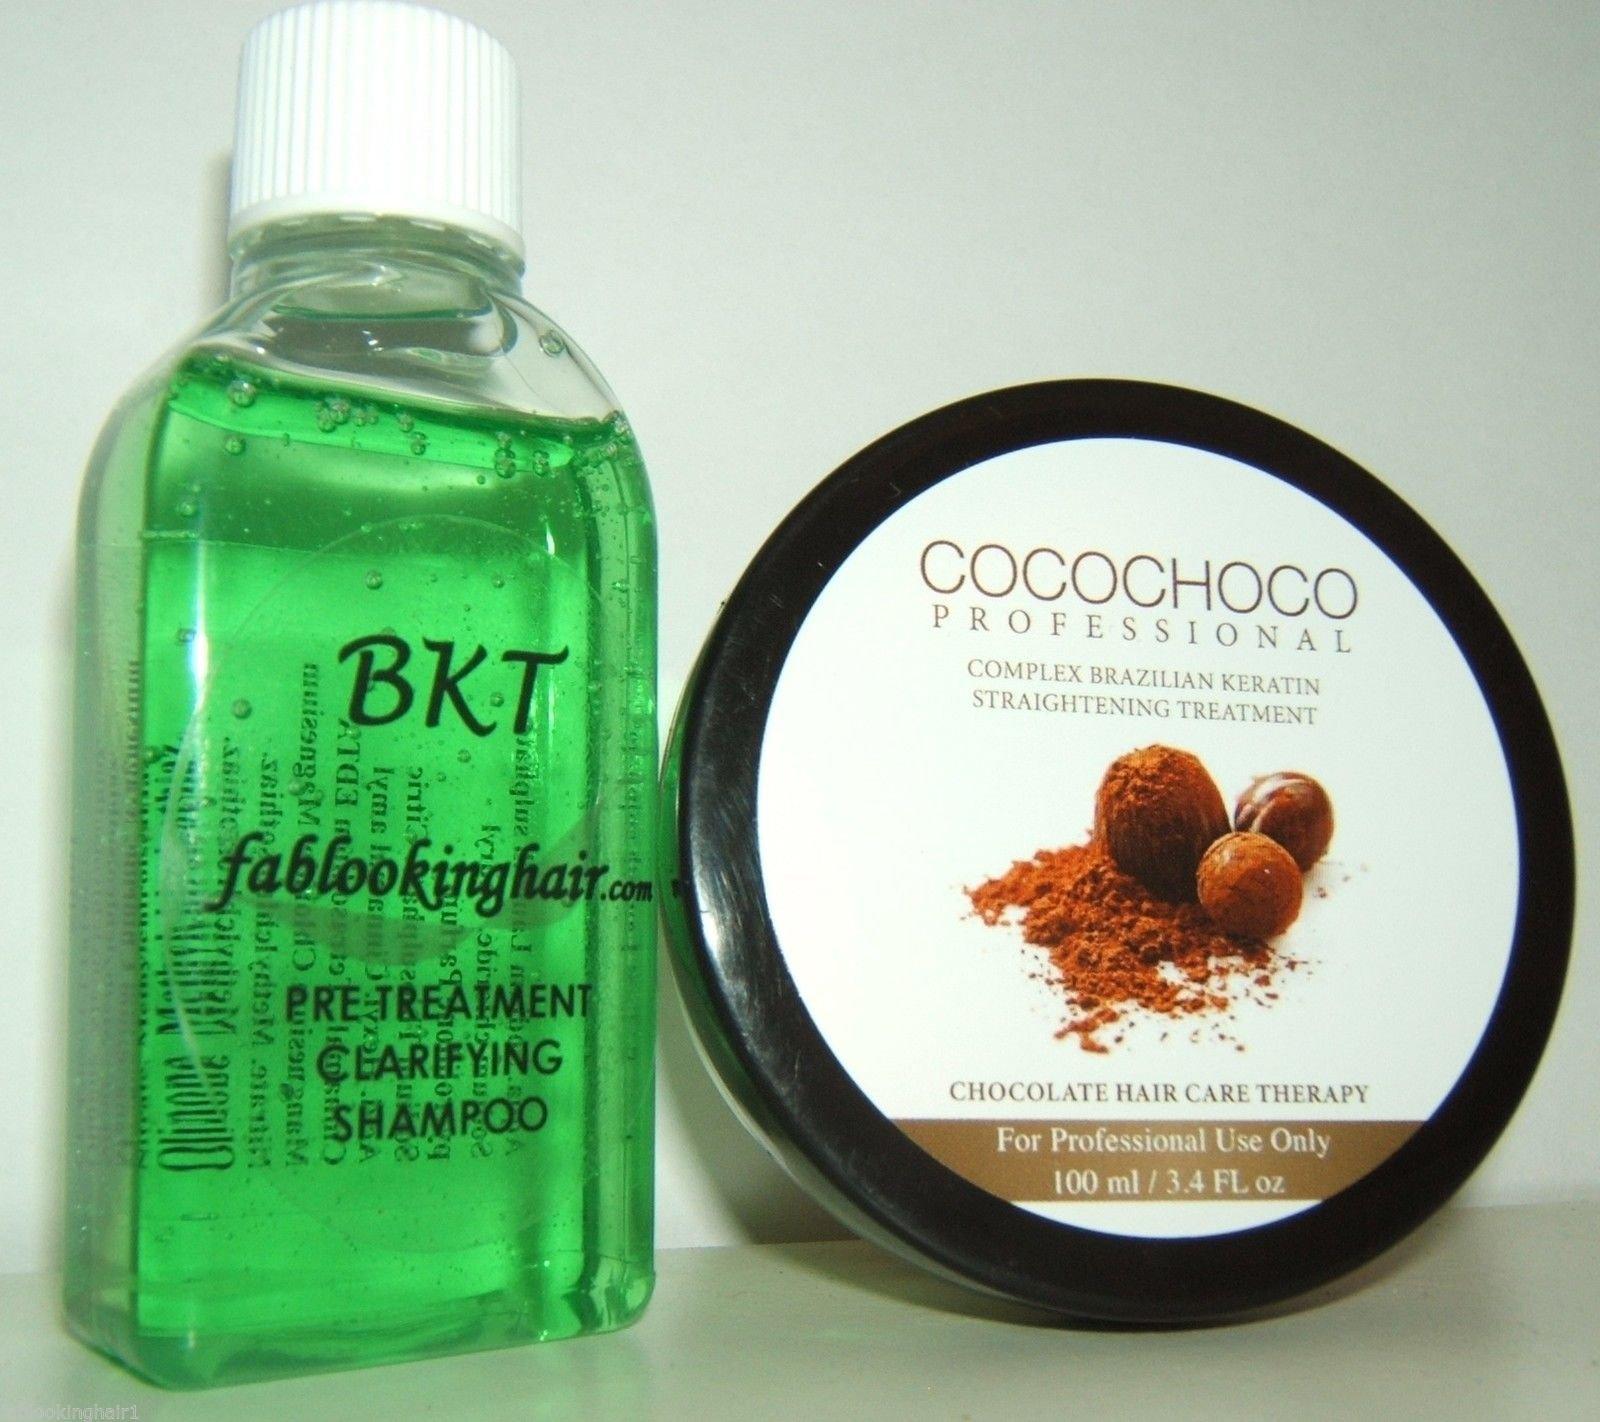 Brazilian Hair Straightening / Blow Dry Home Keratin Treatment 100ml KIT product image